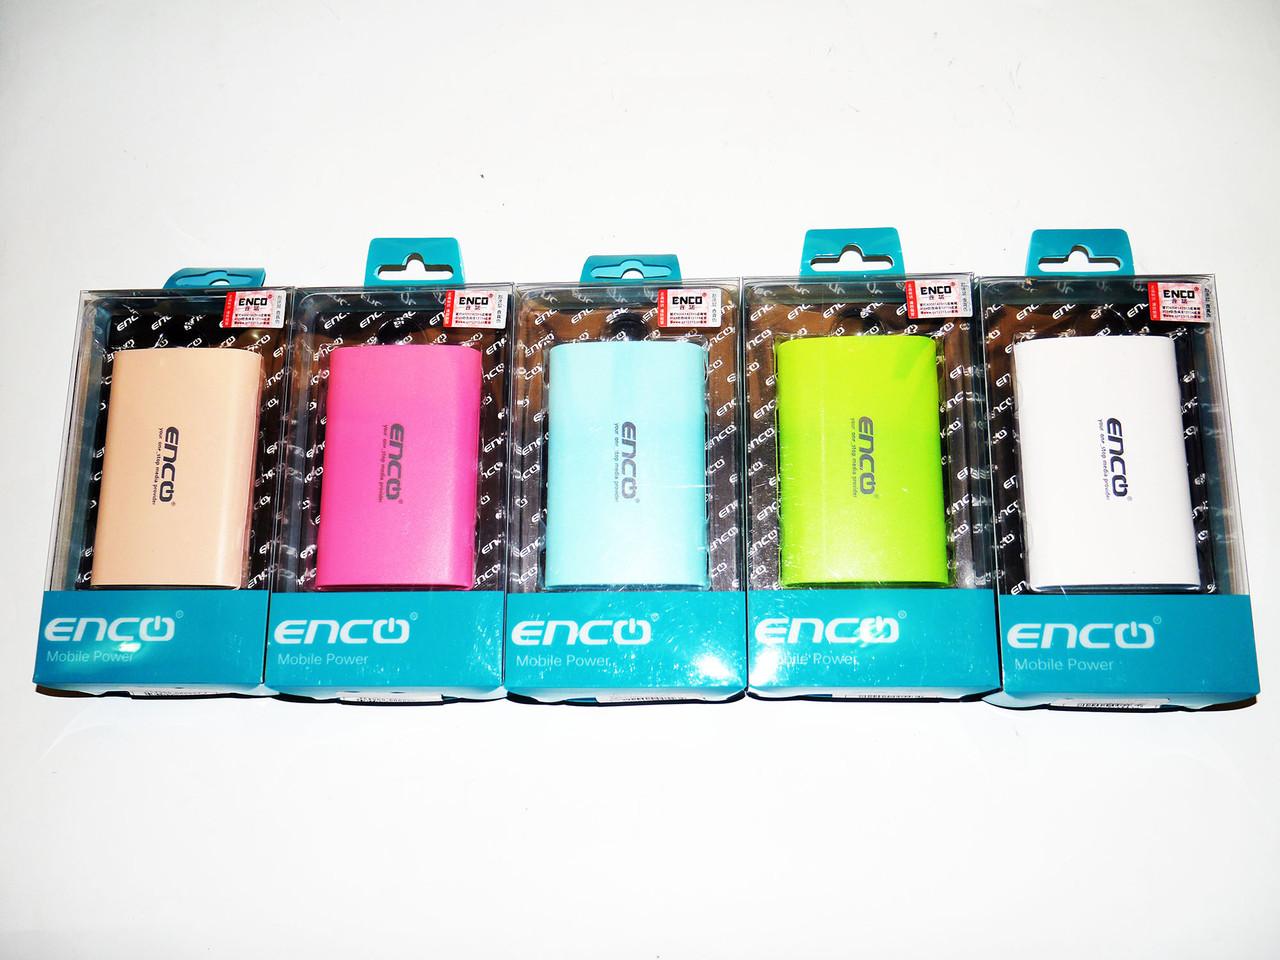 Enco Power Bank 8800mAh Внешний аккумулятор портативное зарядное устройство